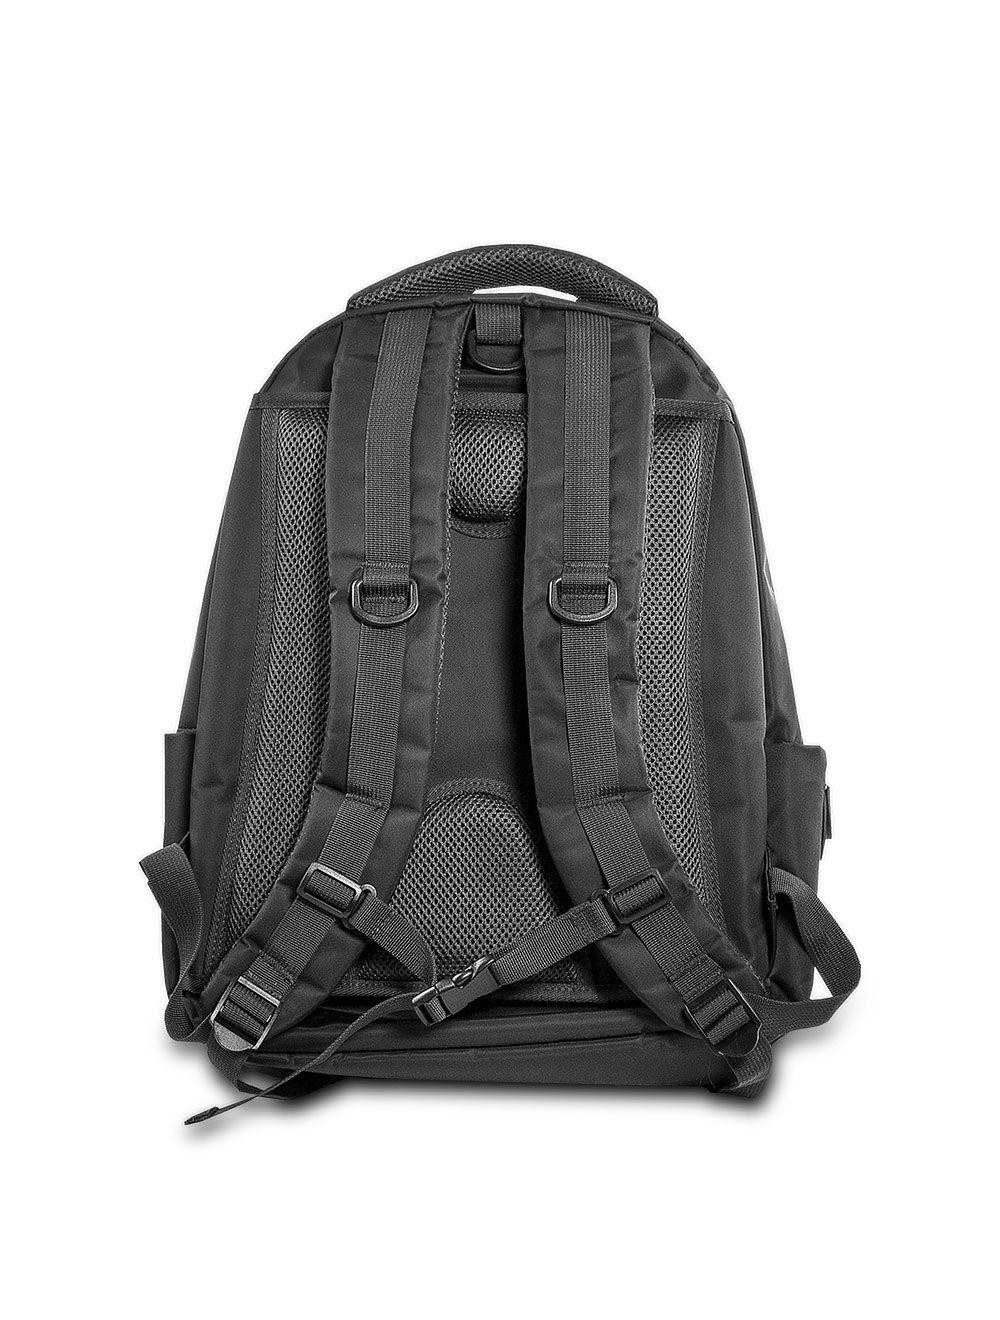 Backpack Nylon/Leather - Black